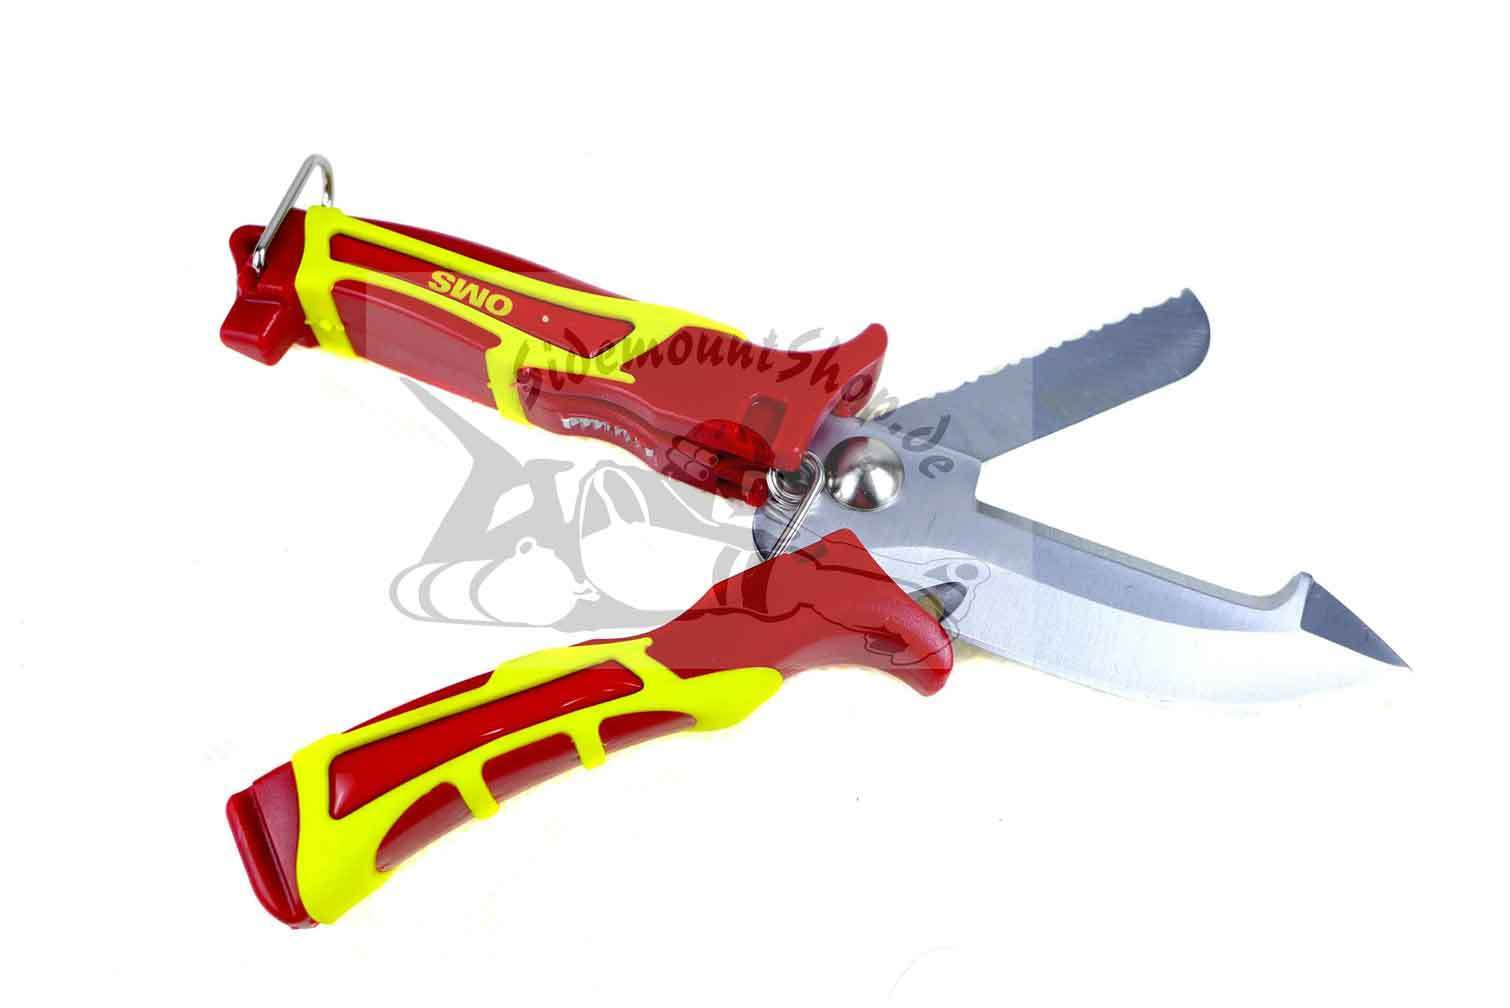 Messer clipart  OMS - SK1/SK2 Scissors/knife - Sidemount Shop